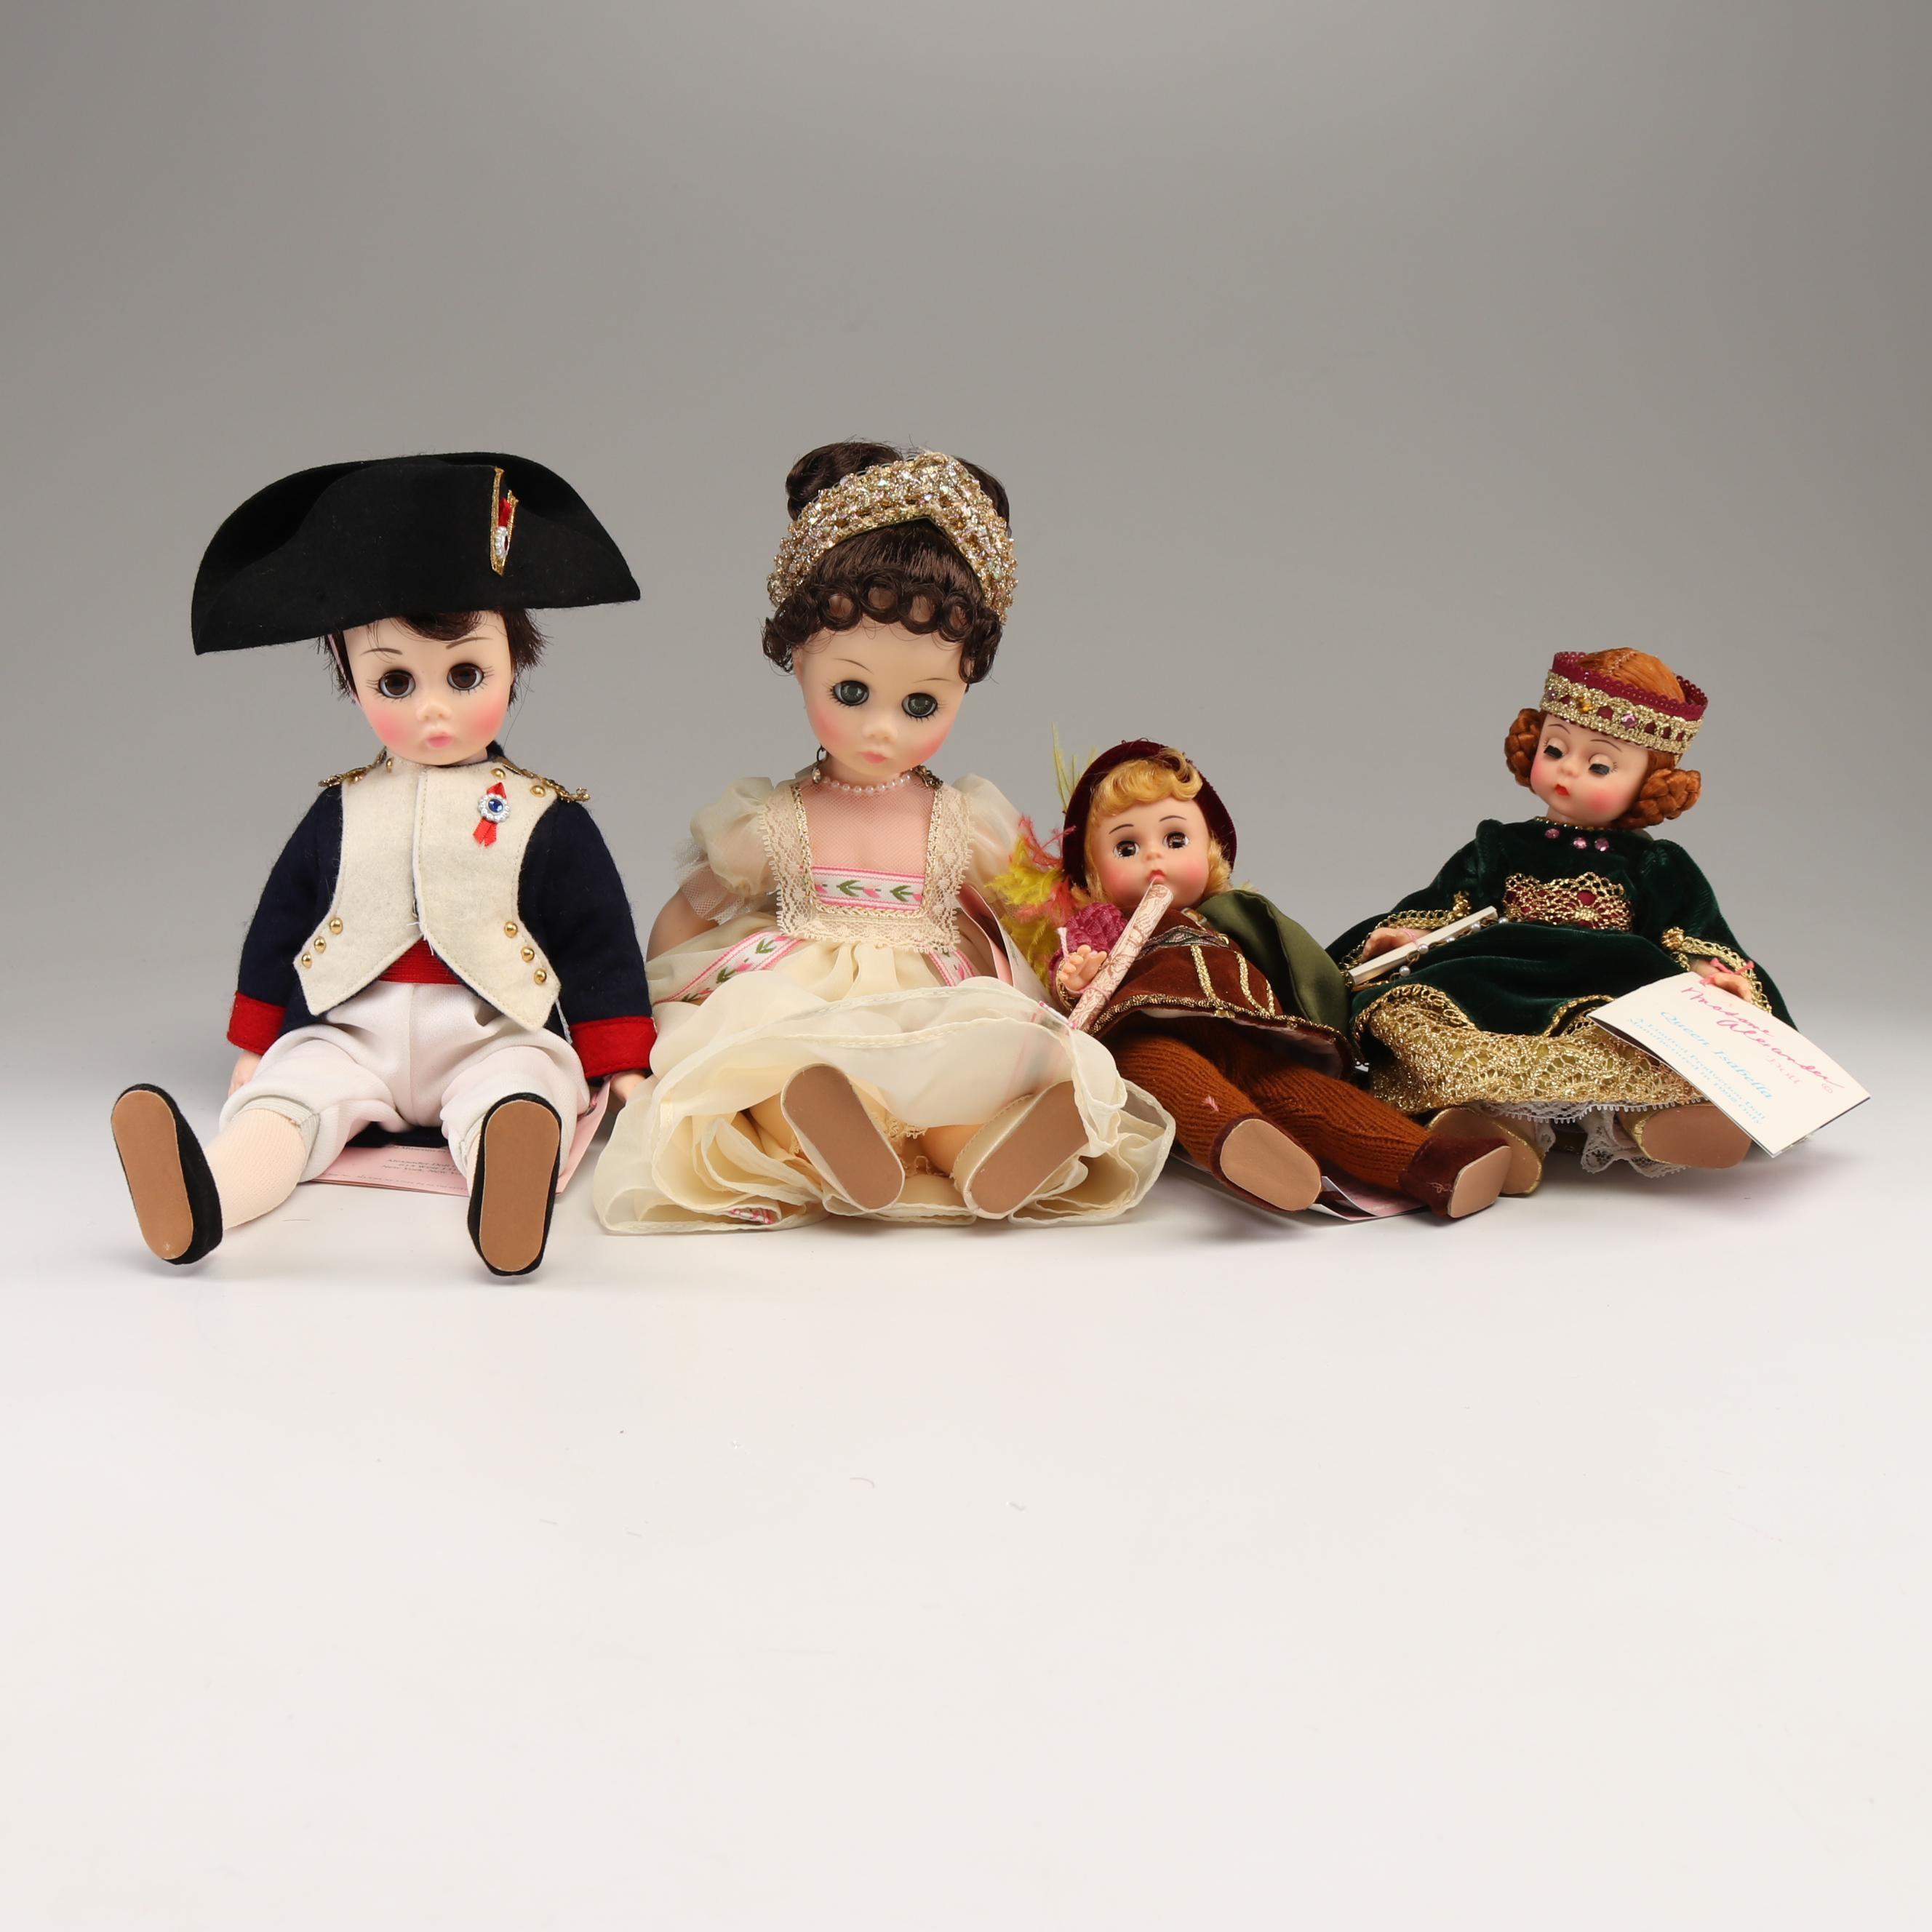 Madame Alexander Dolls Featuring Napoleon and Josephine